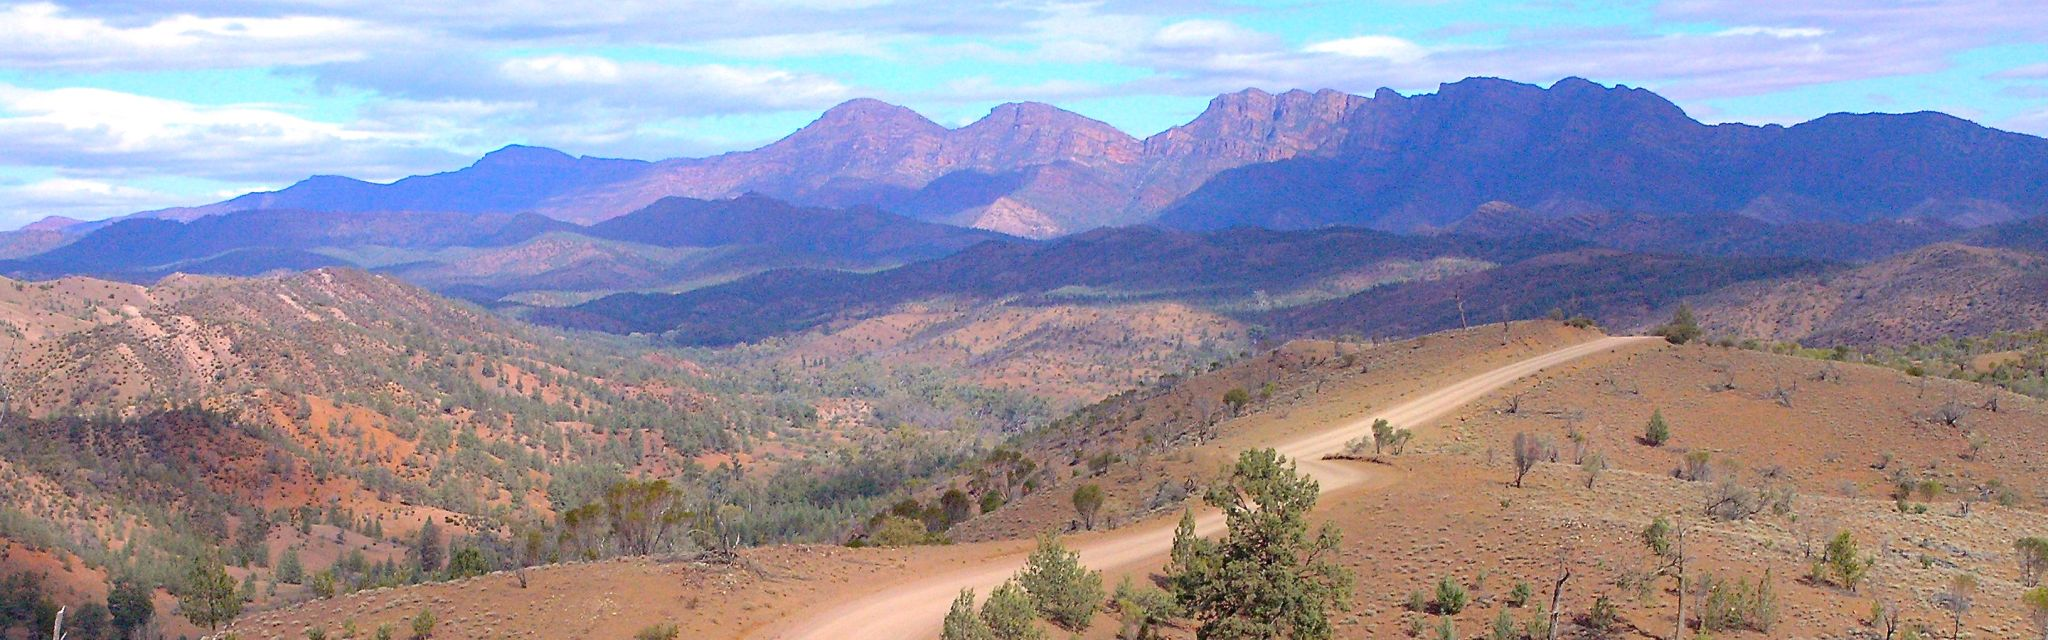 Flinders Ranges, part of the Flinders Ranges Lake Eyre Red Centre Tour